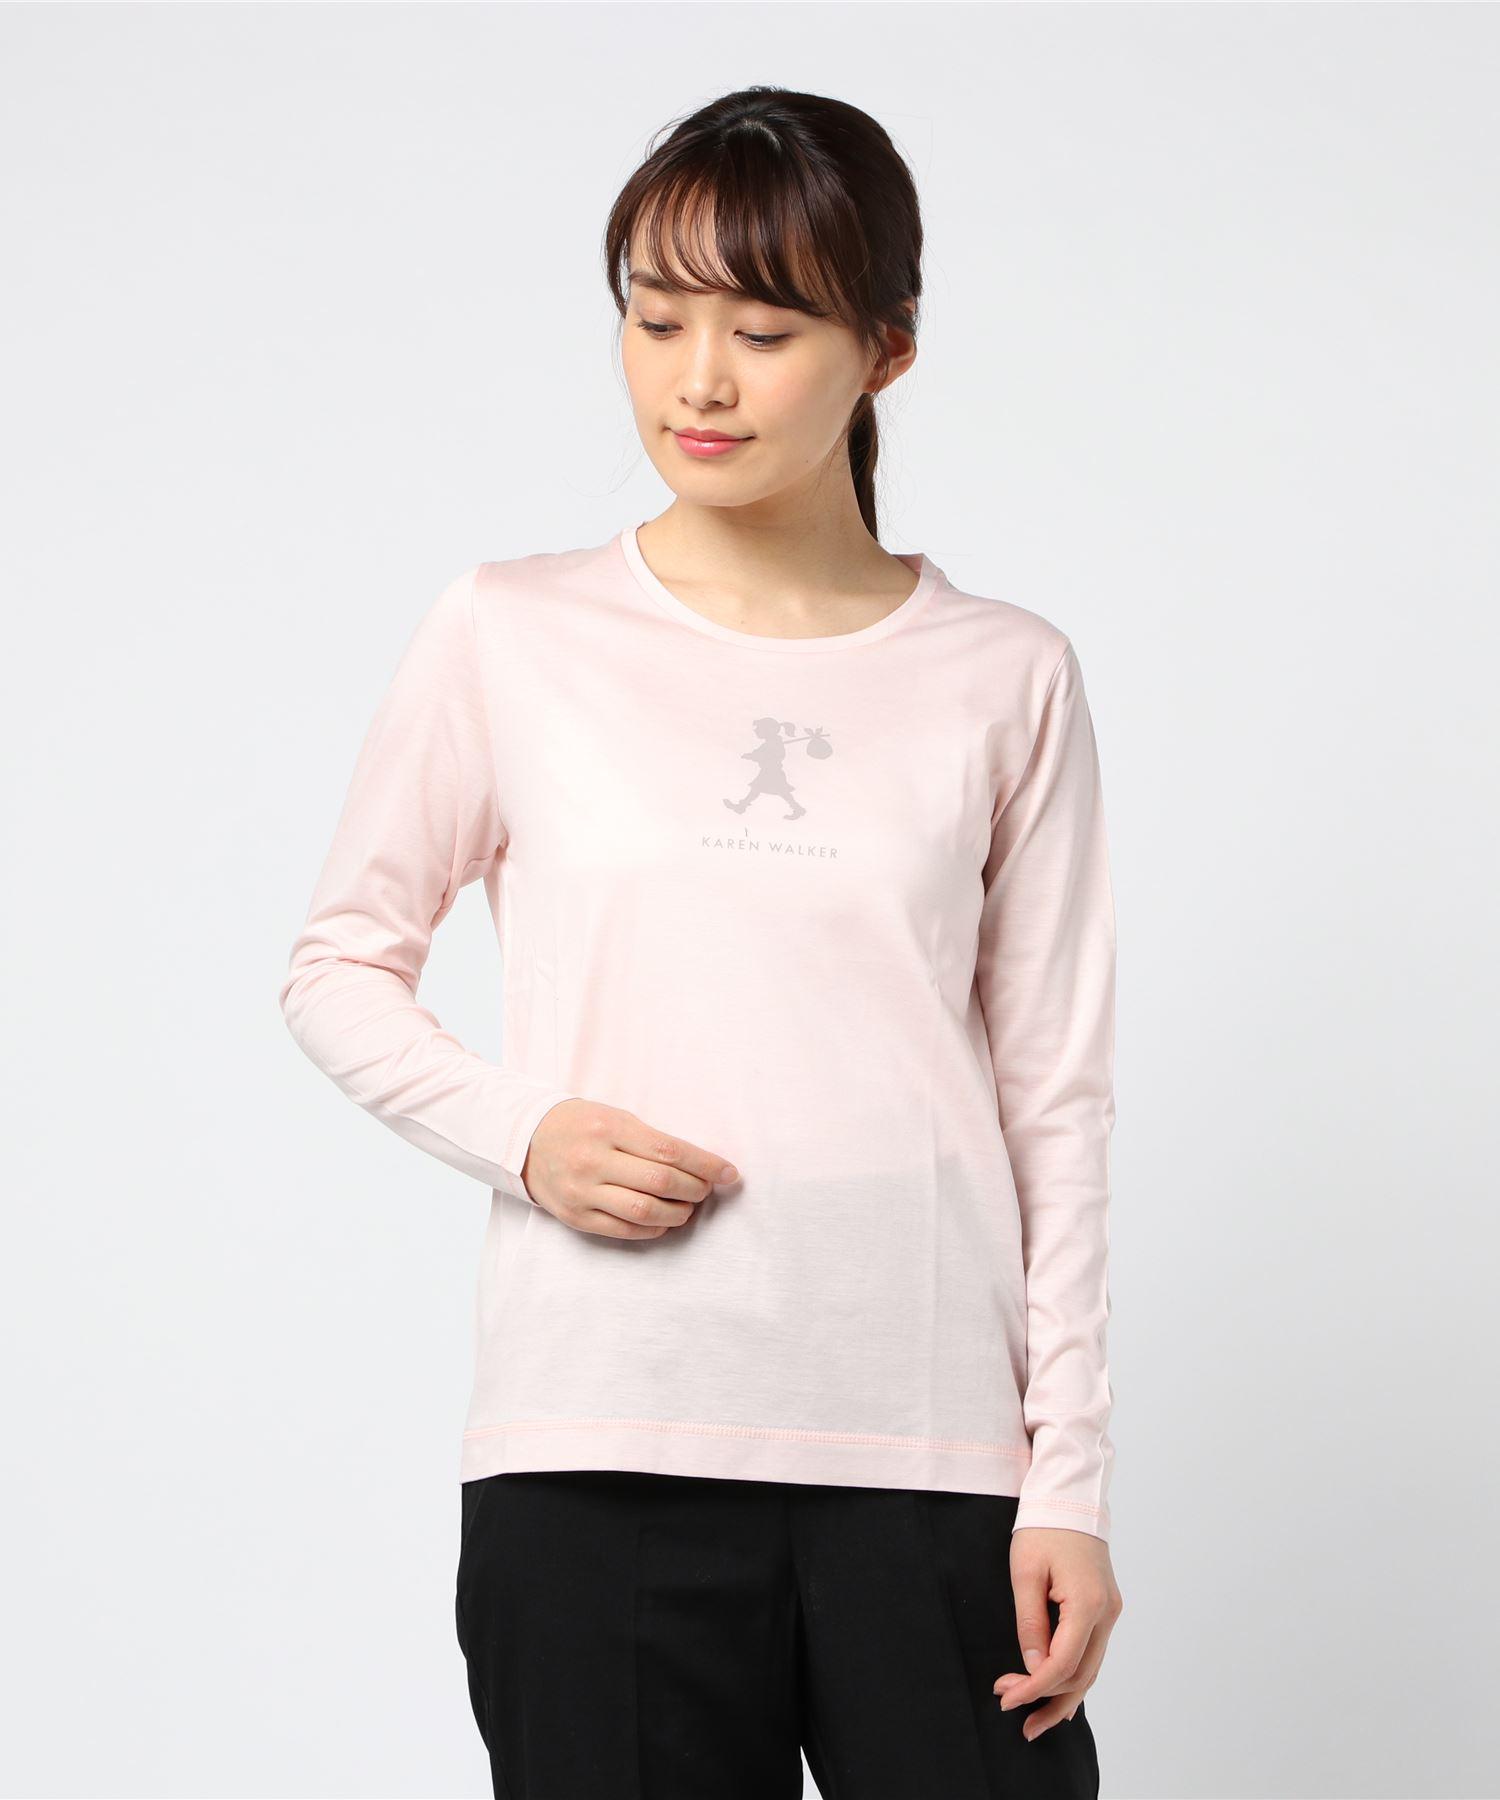 KAREN WALKER カレンウォーカー / ロゴ 長袖ティーシャツ